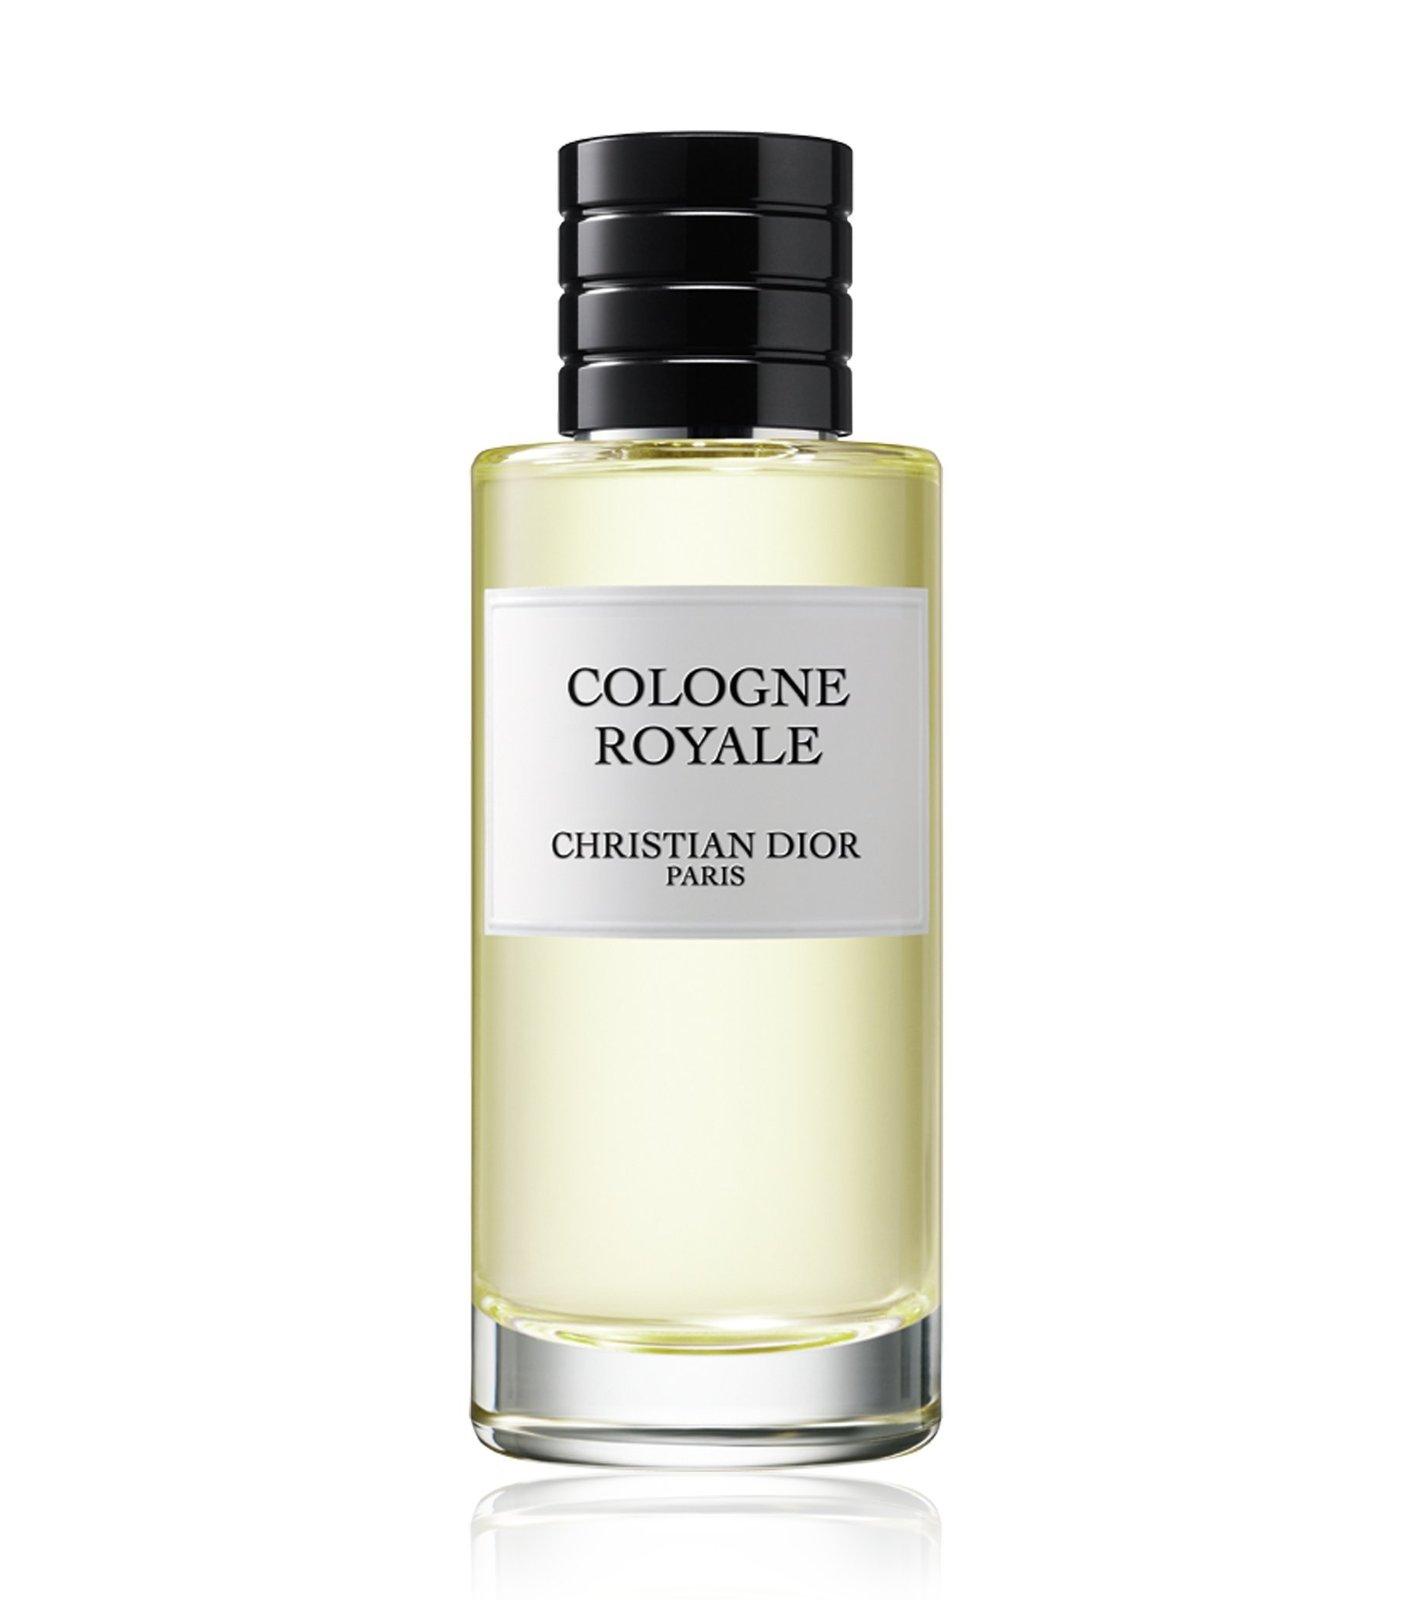 COLOGNE ROYALE by DIOR 10ml Travel Spray LEMON MANDARIN MUSK NEROLI Perfume